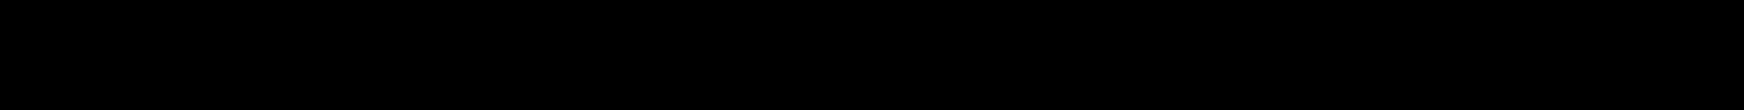 MetaOffcPro-CondMedium.ttf